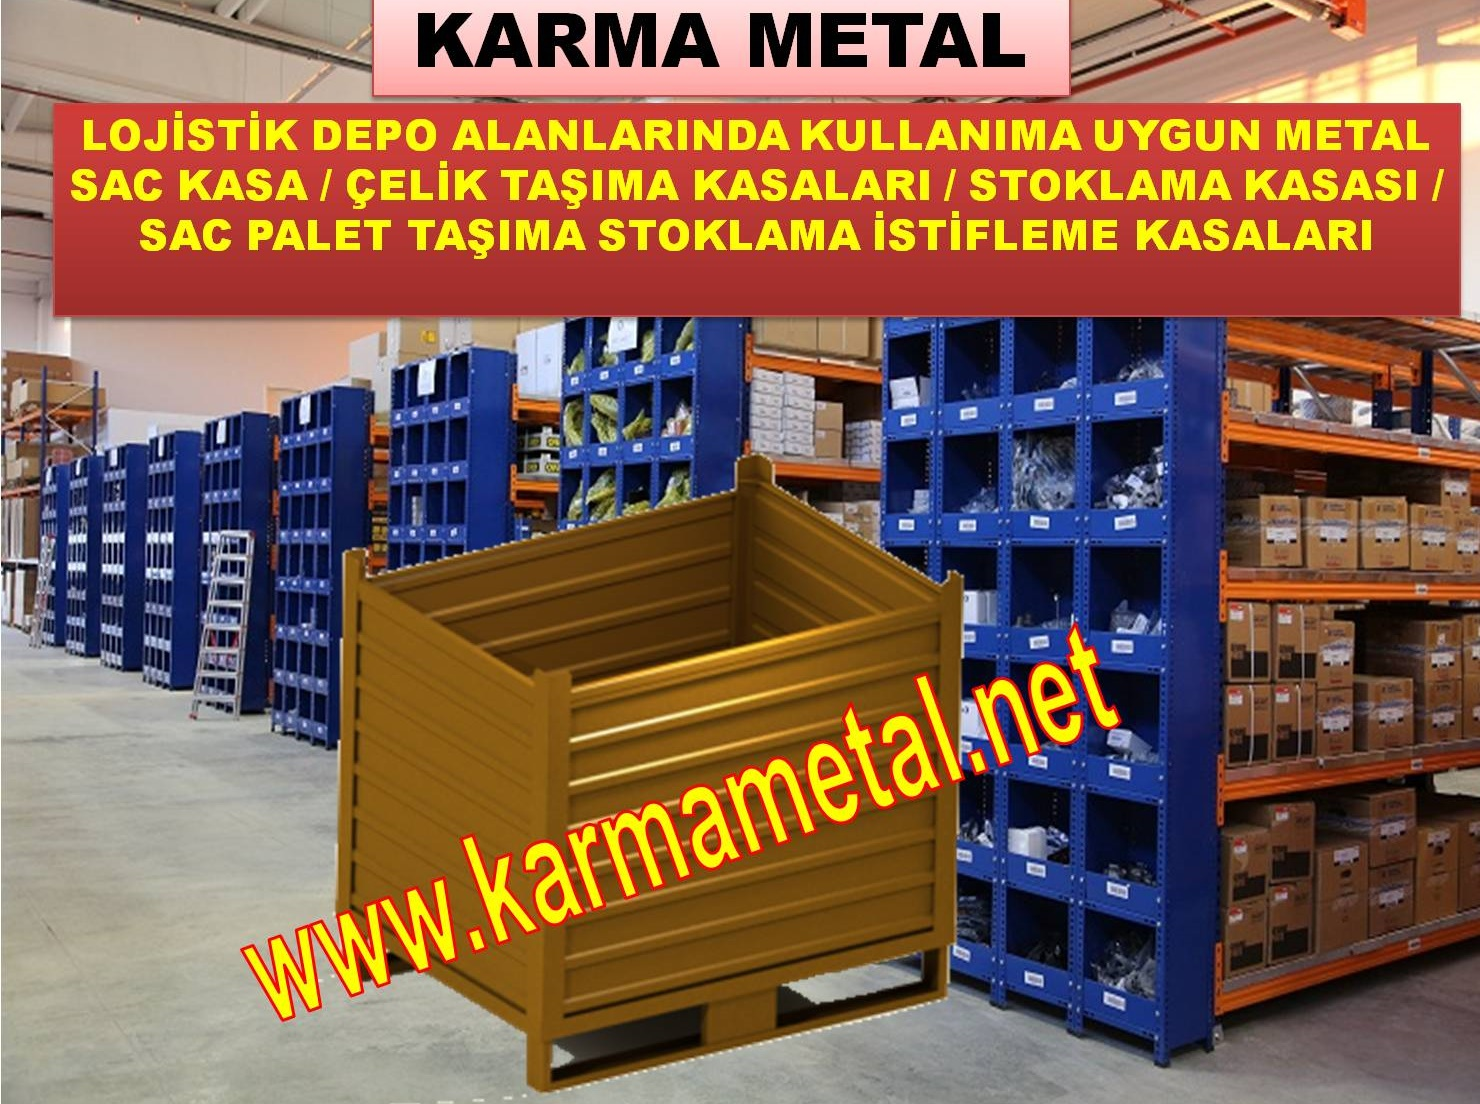 katlanabilir_katlanir__kasa__metal_celik_sac_tasima_stoklama_istifleme__kasasi_kasalari_sandiklari (1)